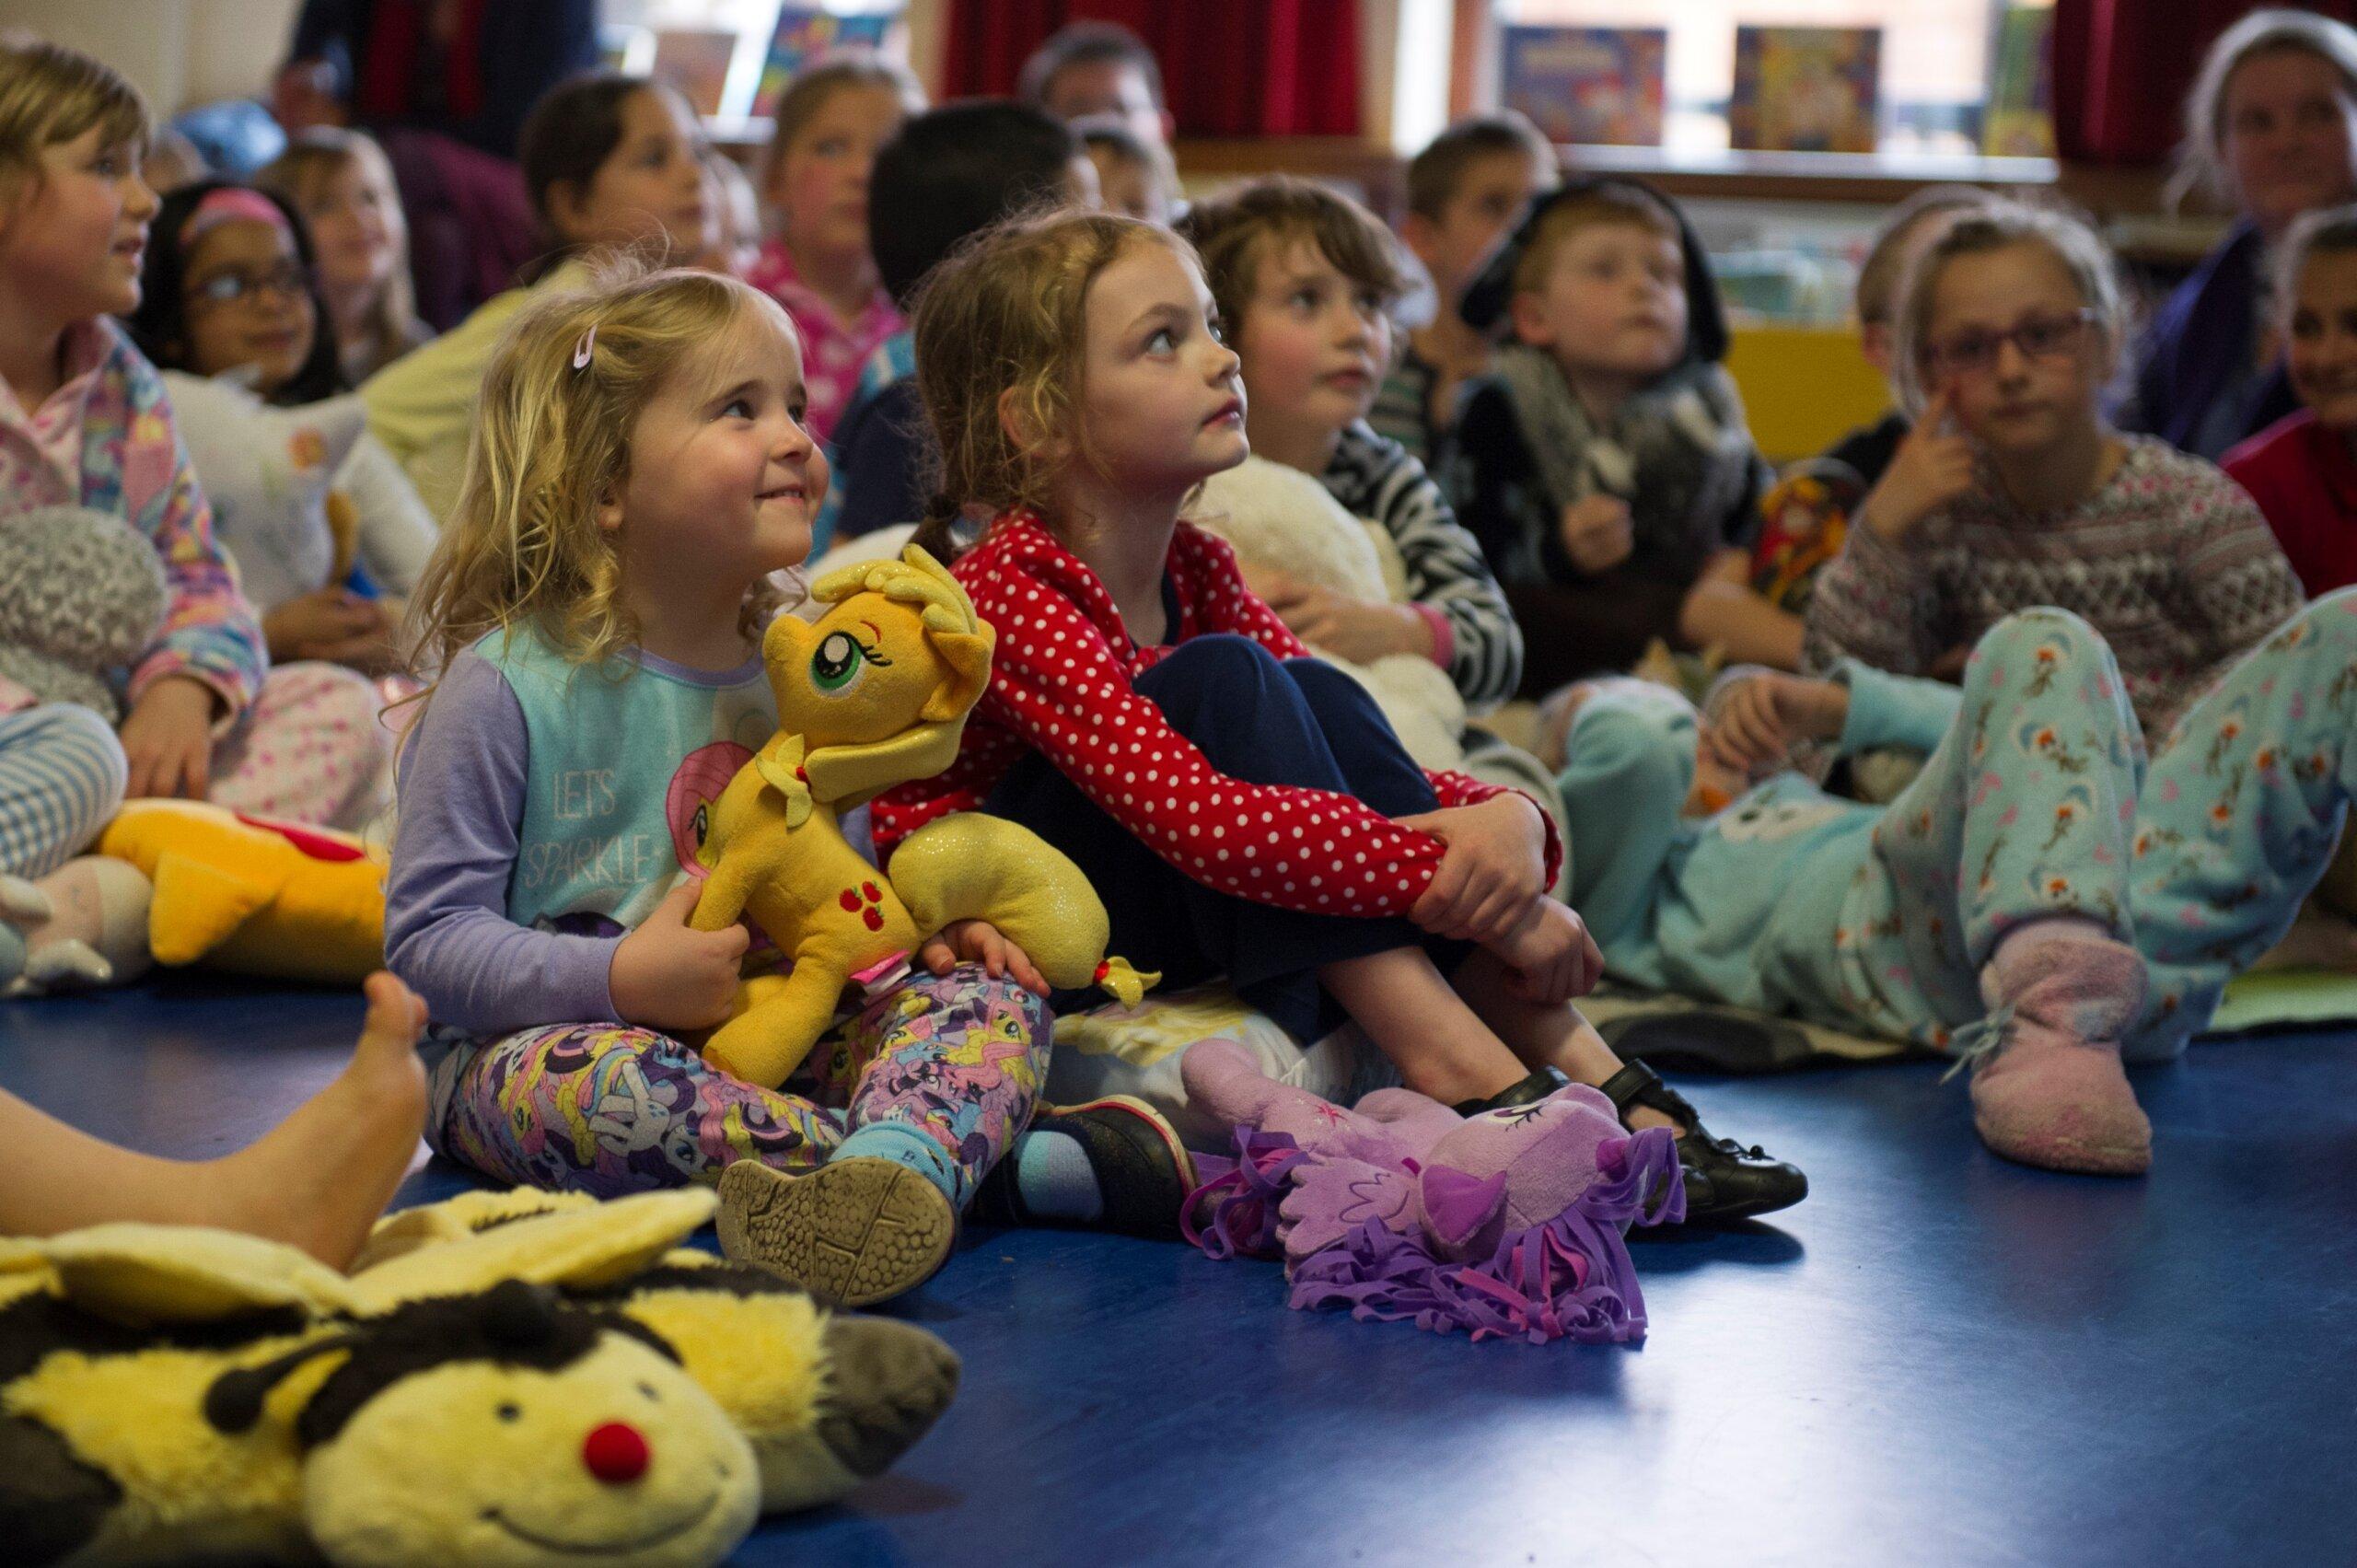 Encouraging family bonds through storytelling